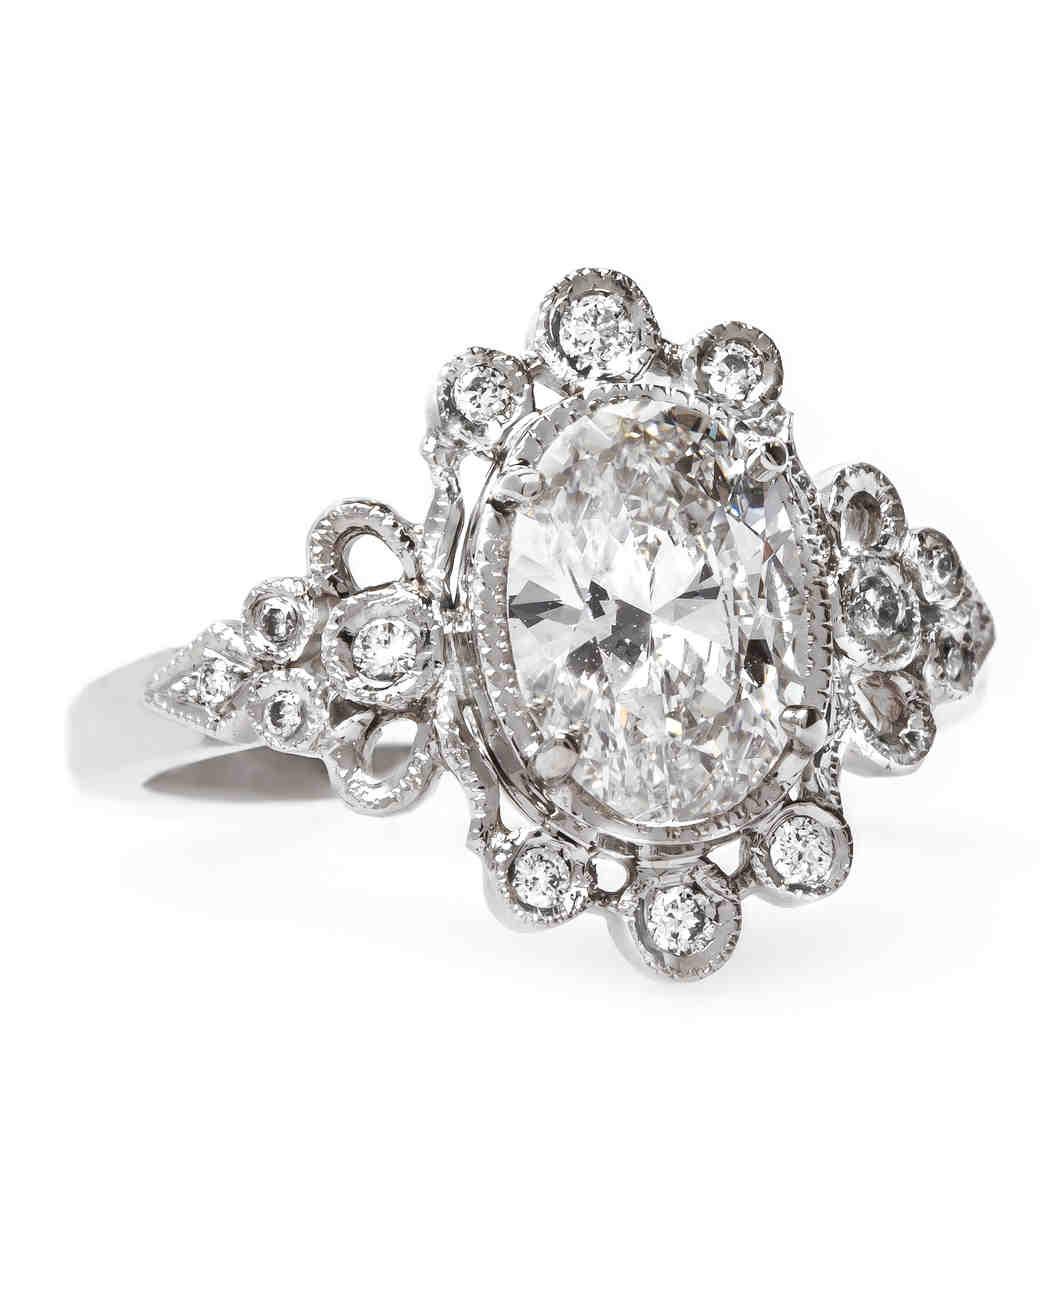 claire-pettibone-ring-collection-big-diamond-0915.jpg